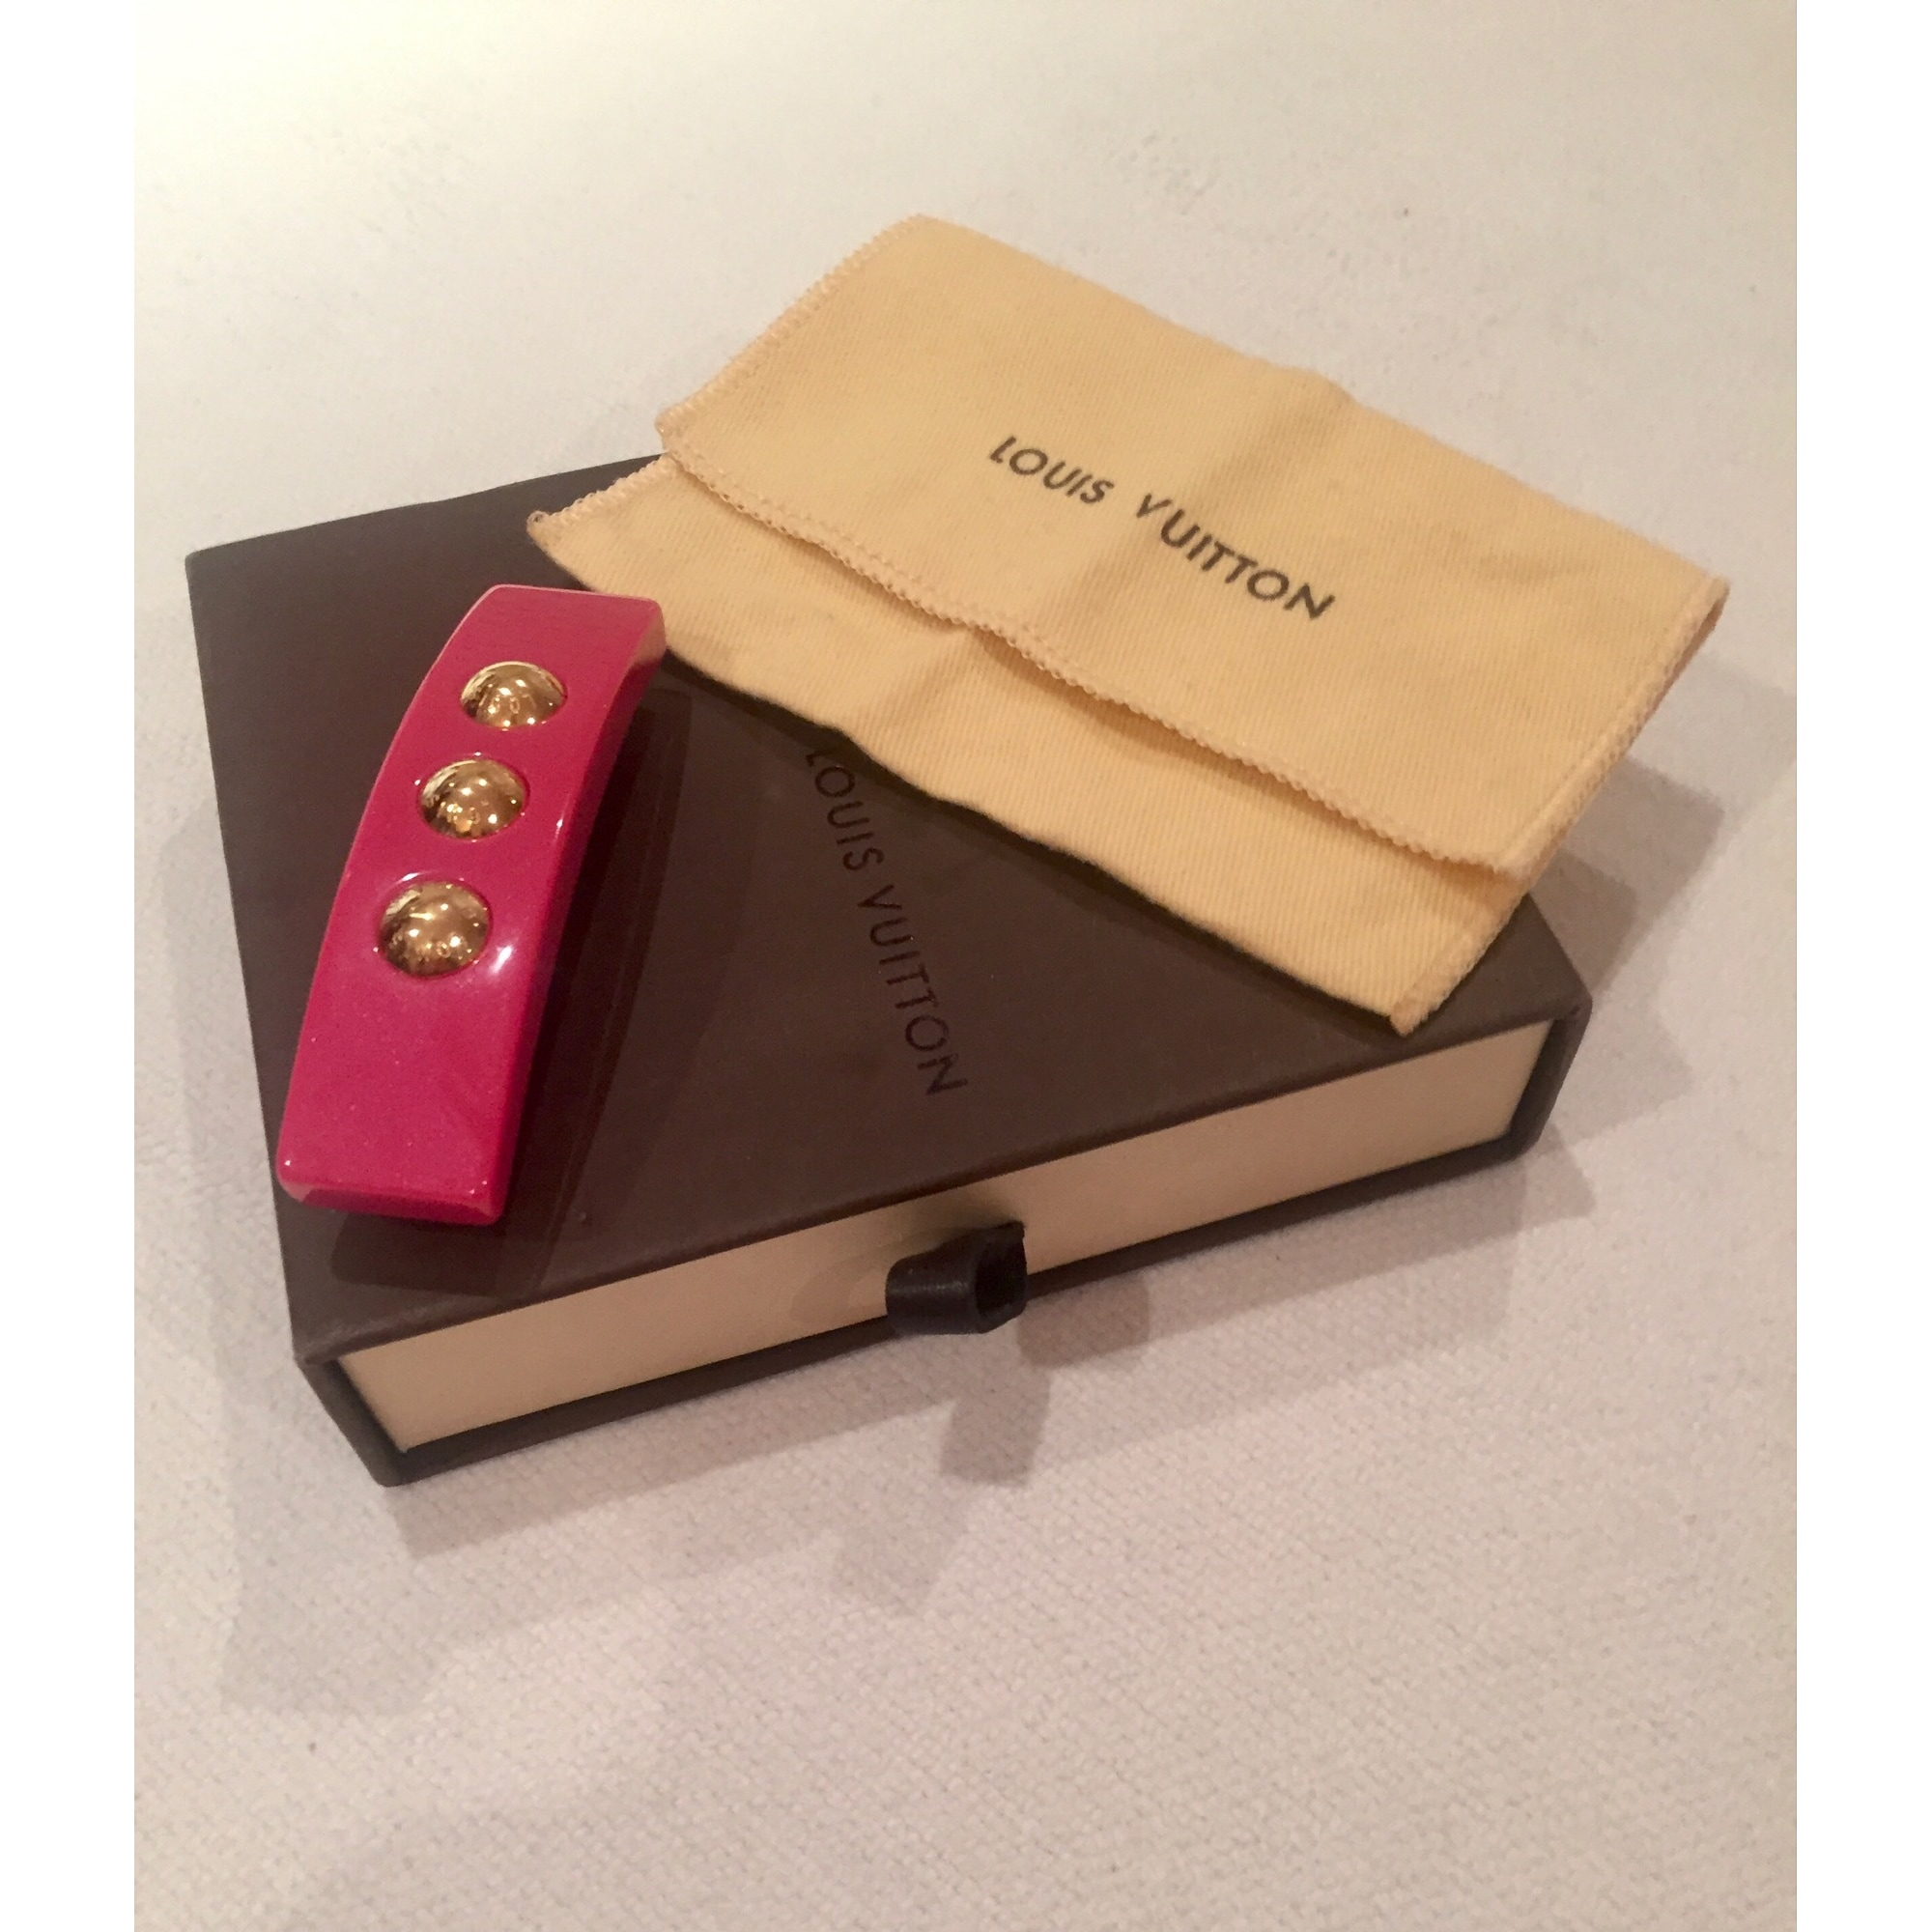 Hairclip LOUIS VUITTON Pink, fuchsia, light pink